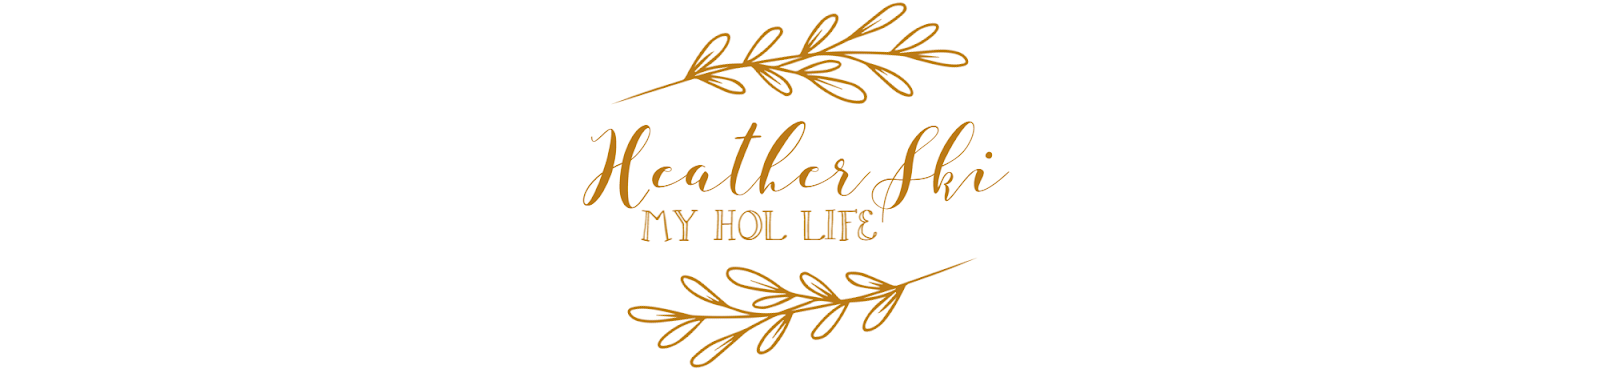 Heather Ski: My Hol Life